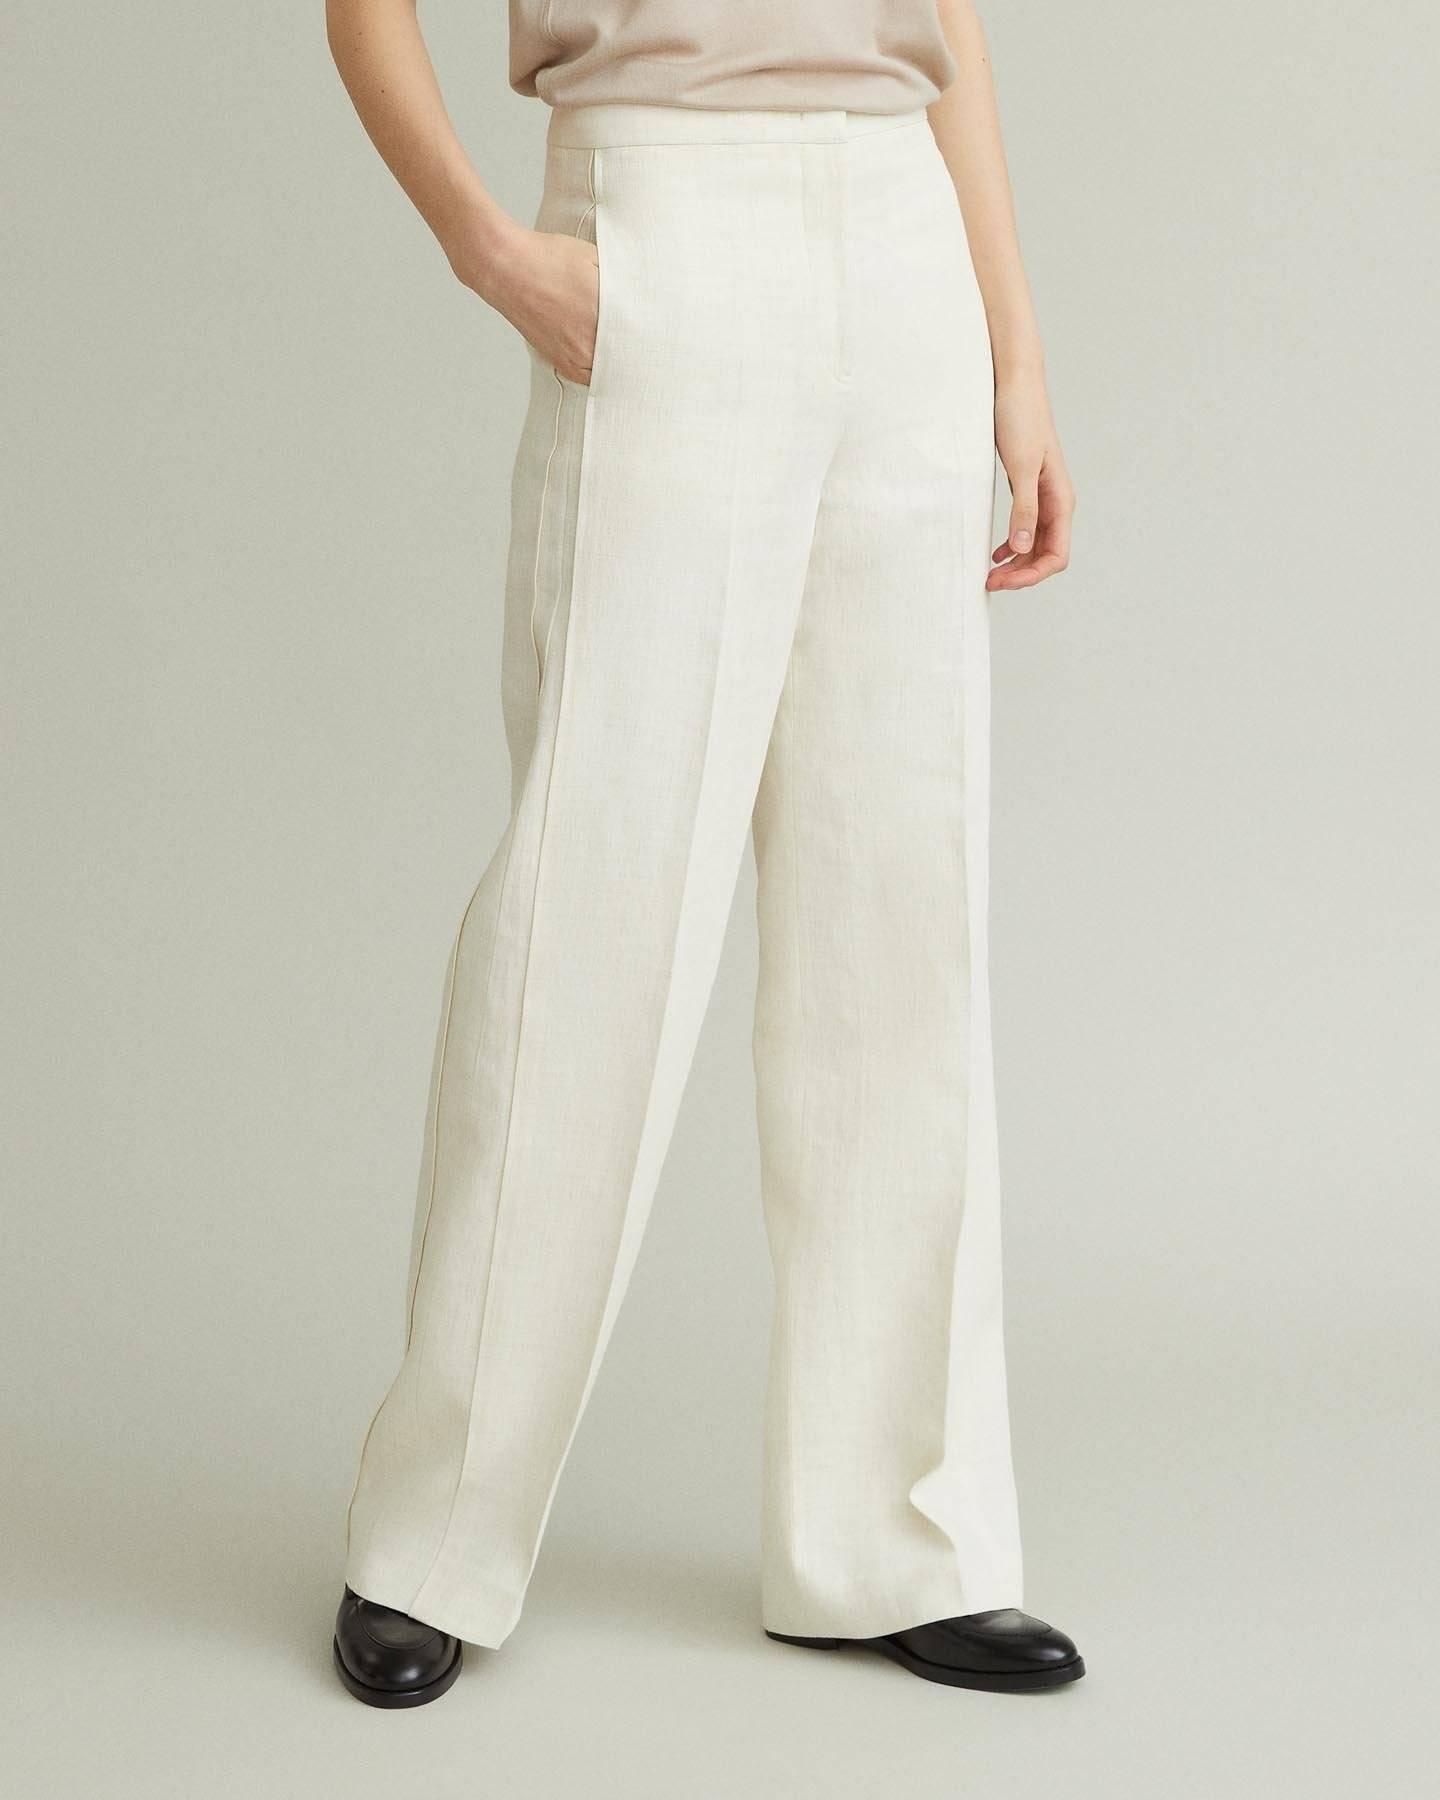 /products/glenn-linen-blend-trousers